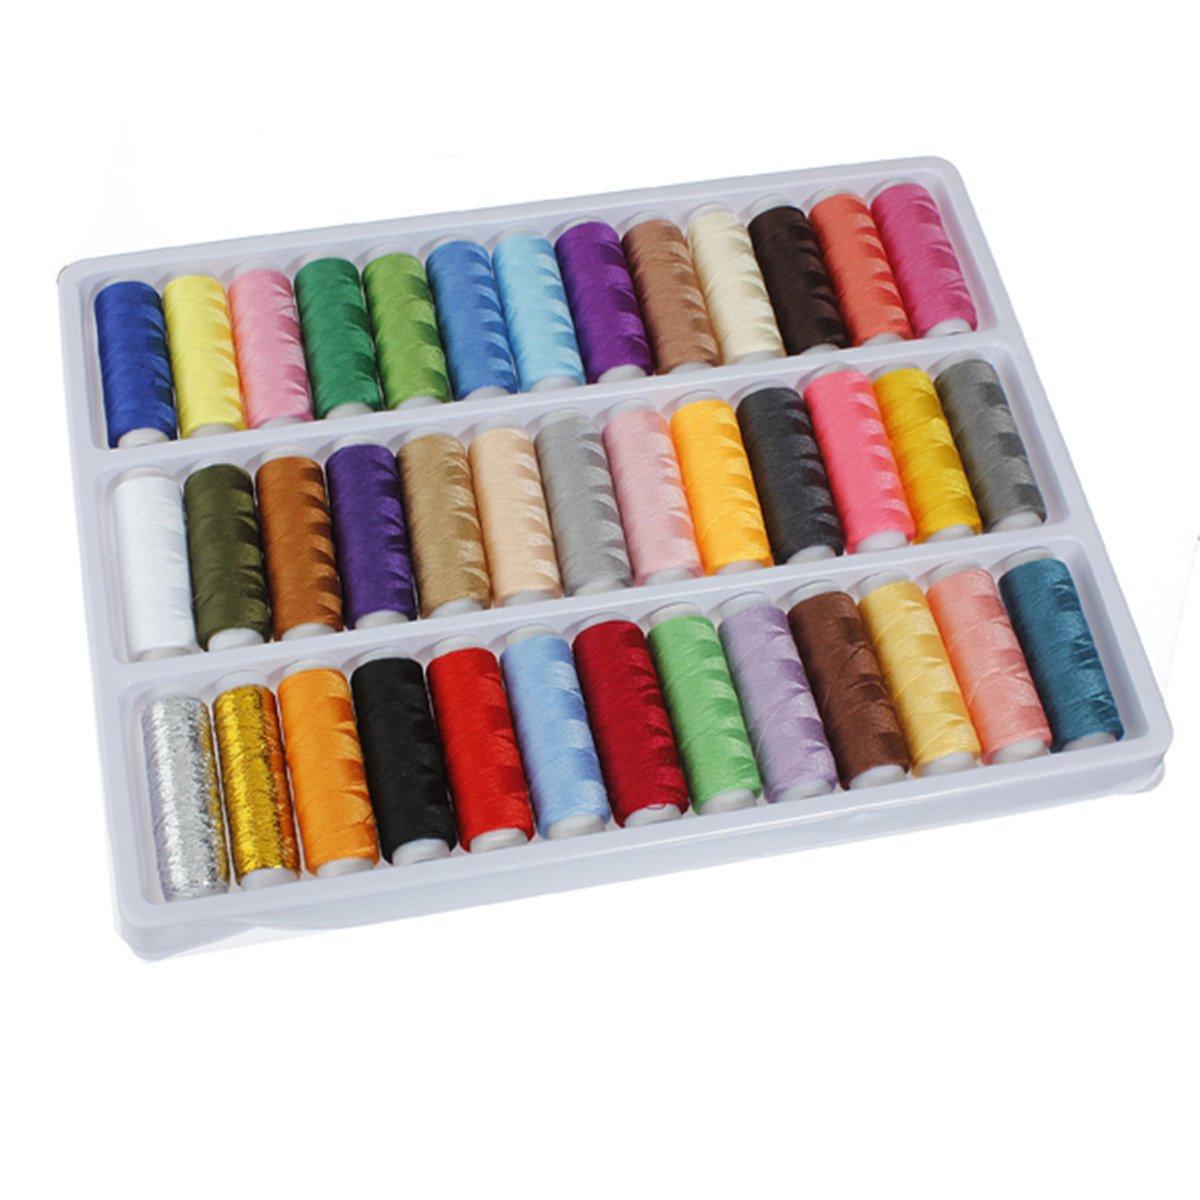 Carretes JEYL 39 de colores surtidos hilo de poliéster para máquina de coser a mano